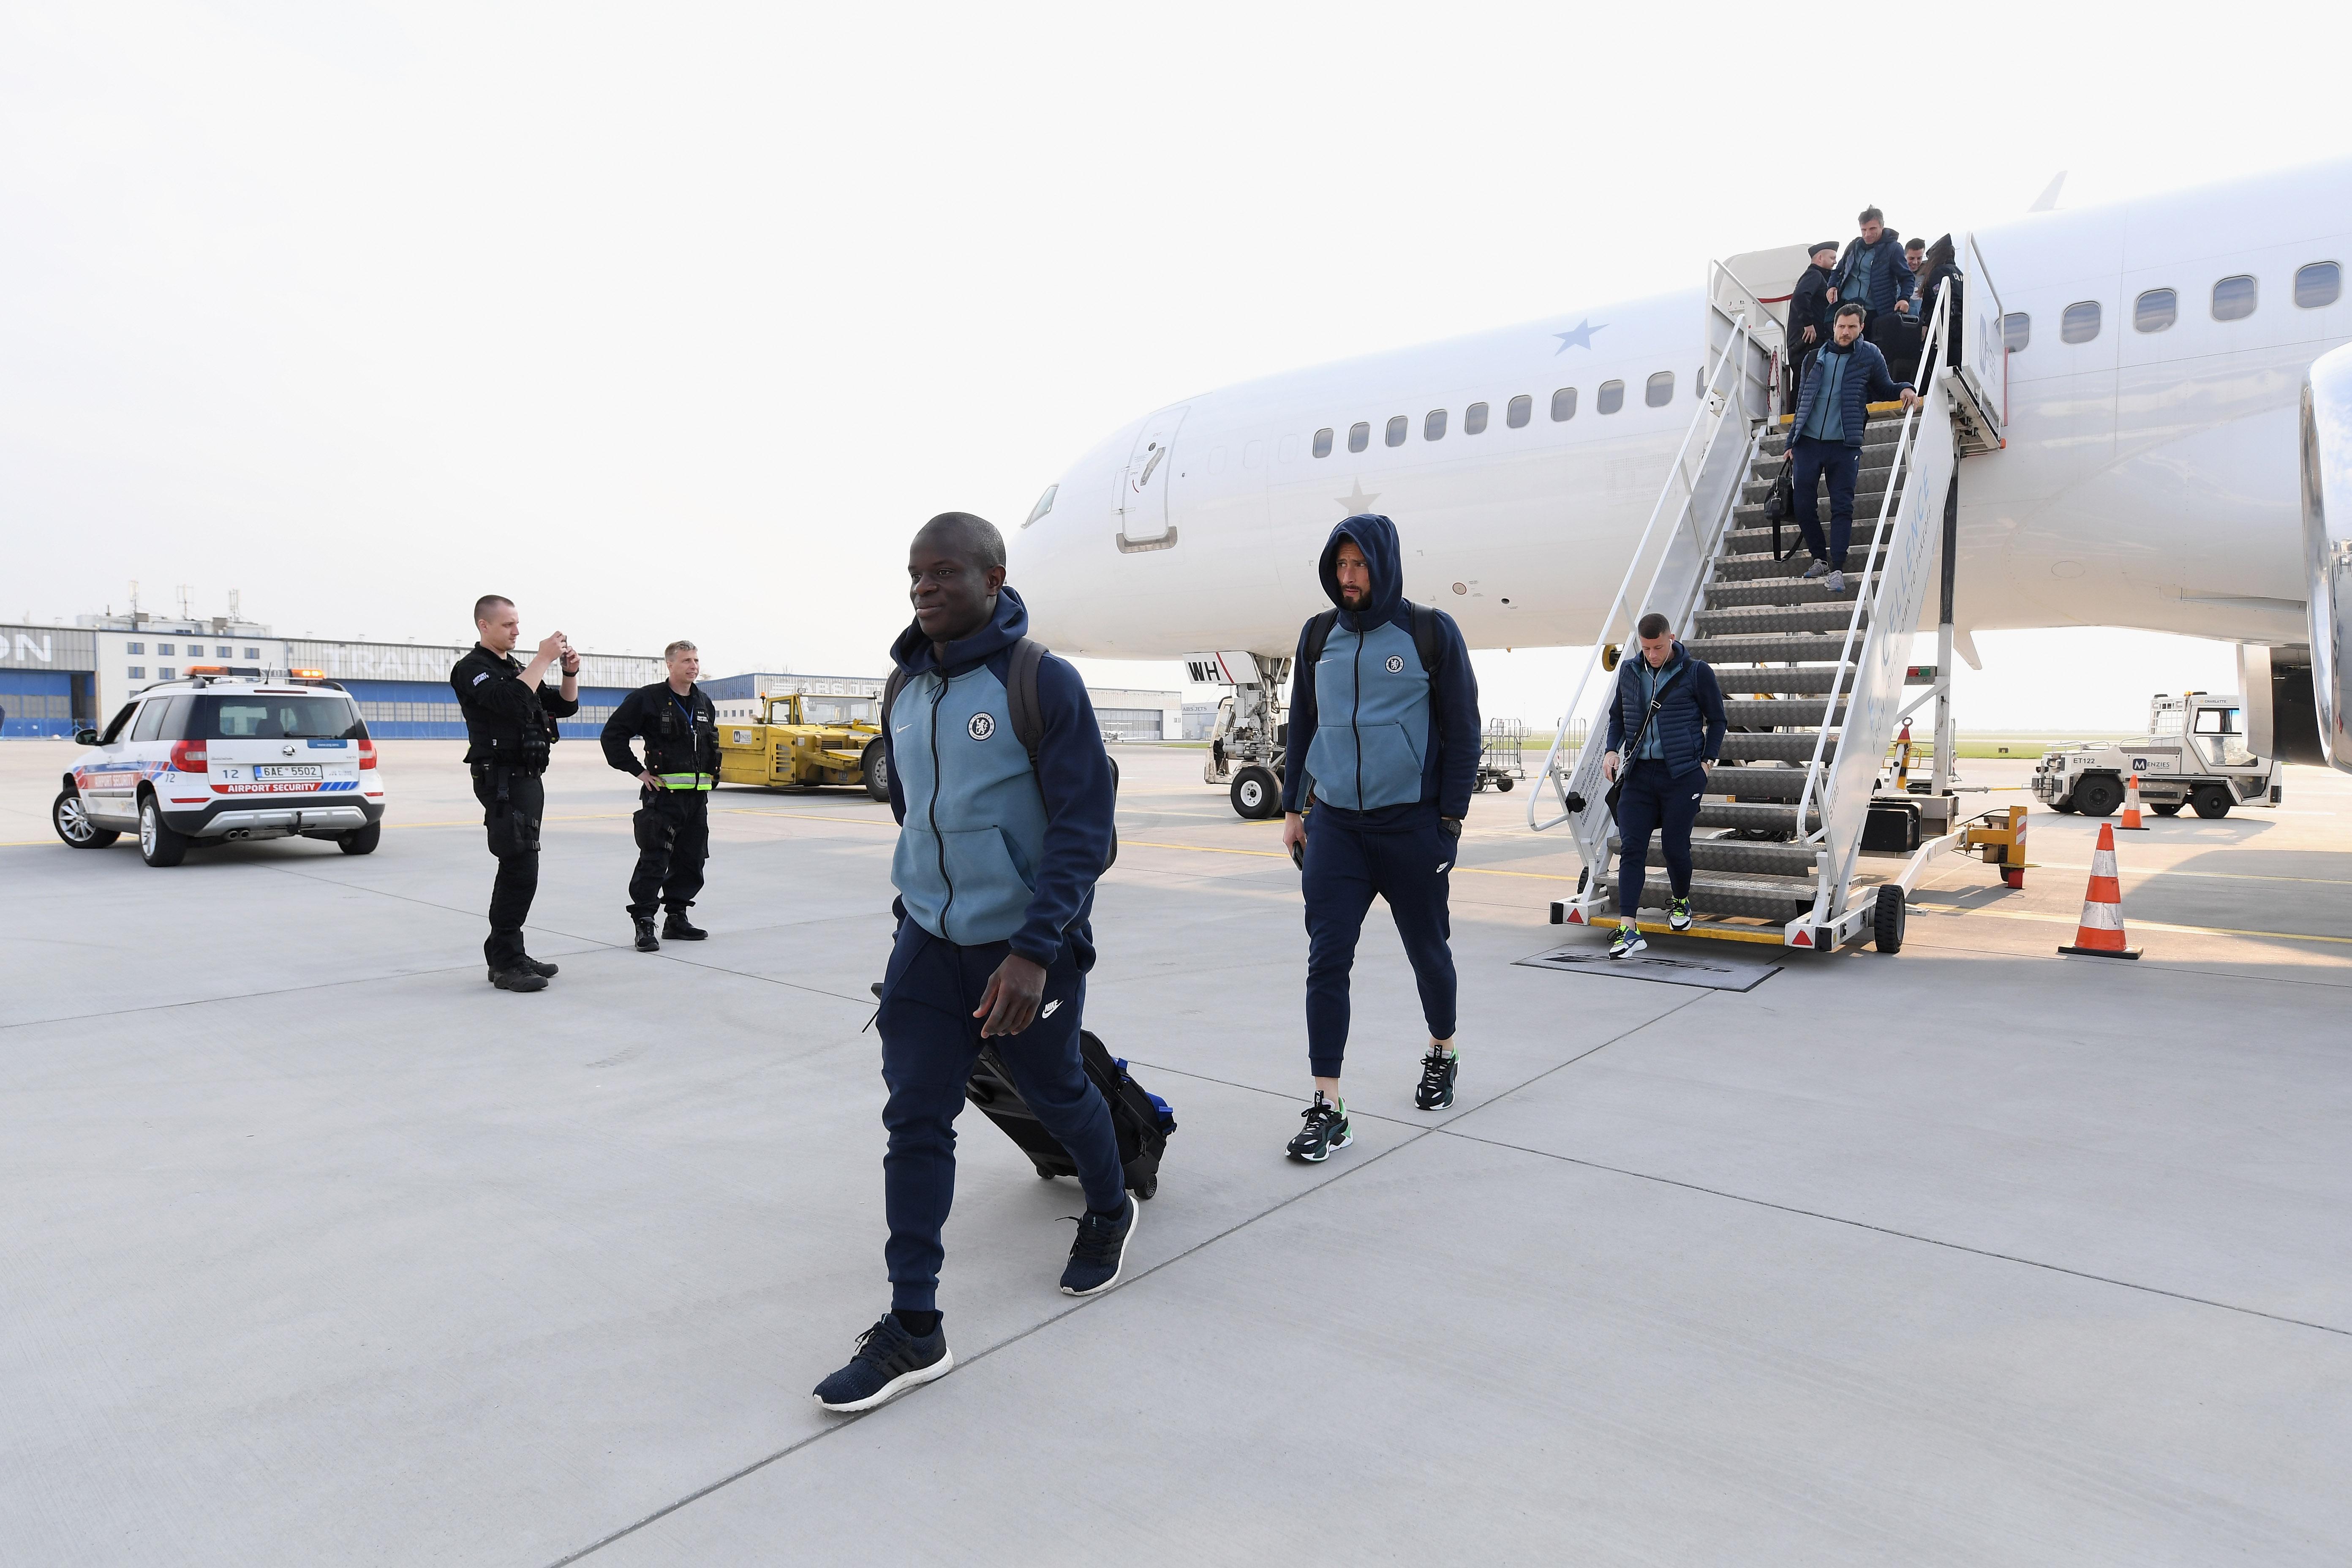 Chelsea take full squad to Prague for Europa League quarterfinal, first leg